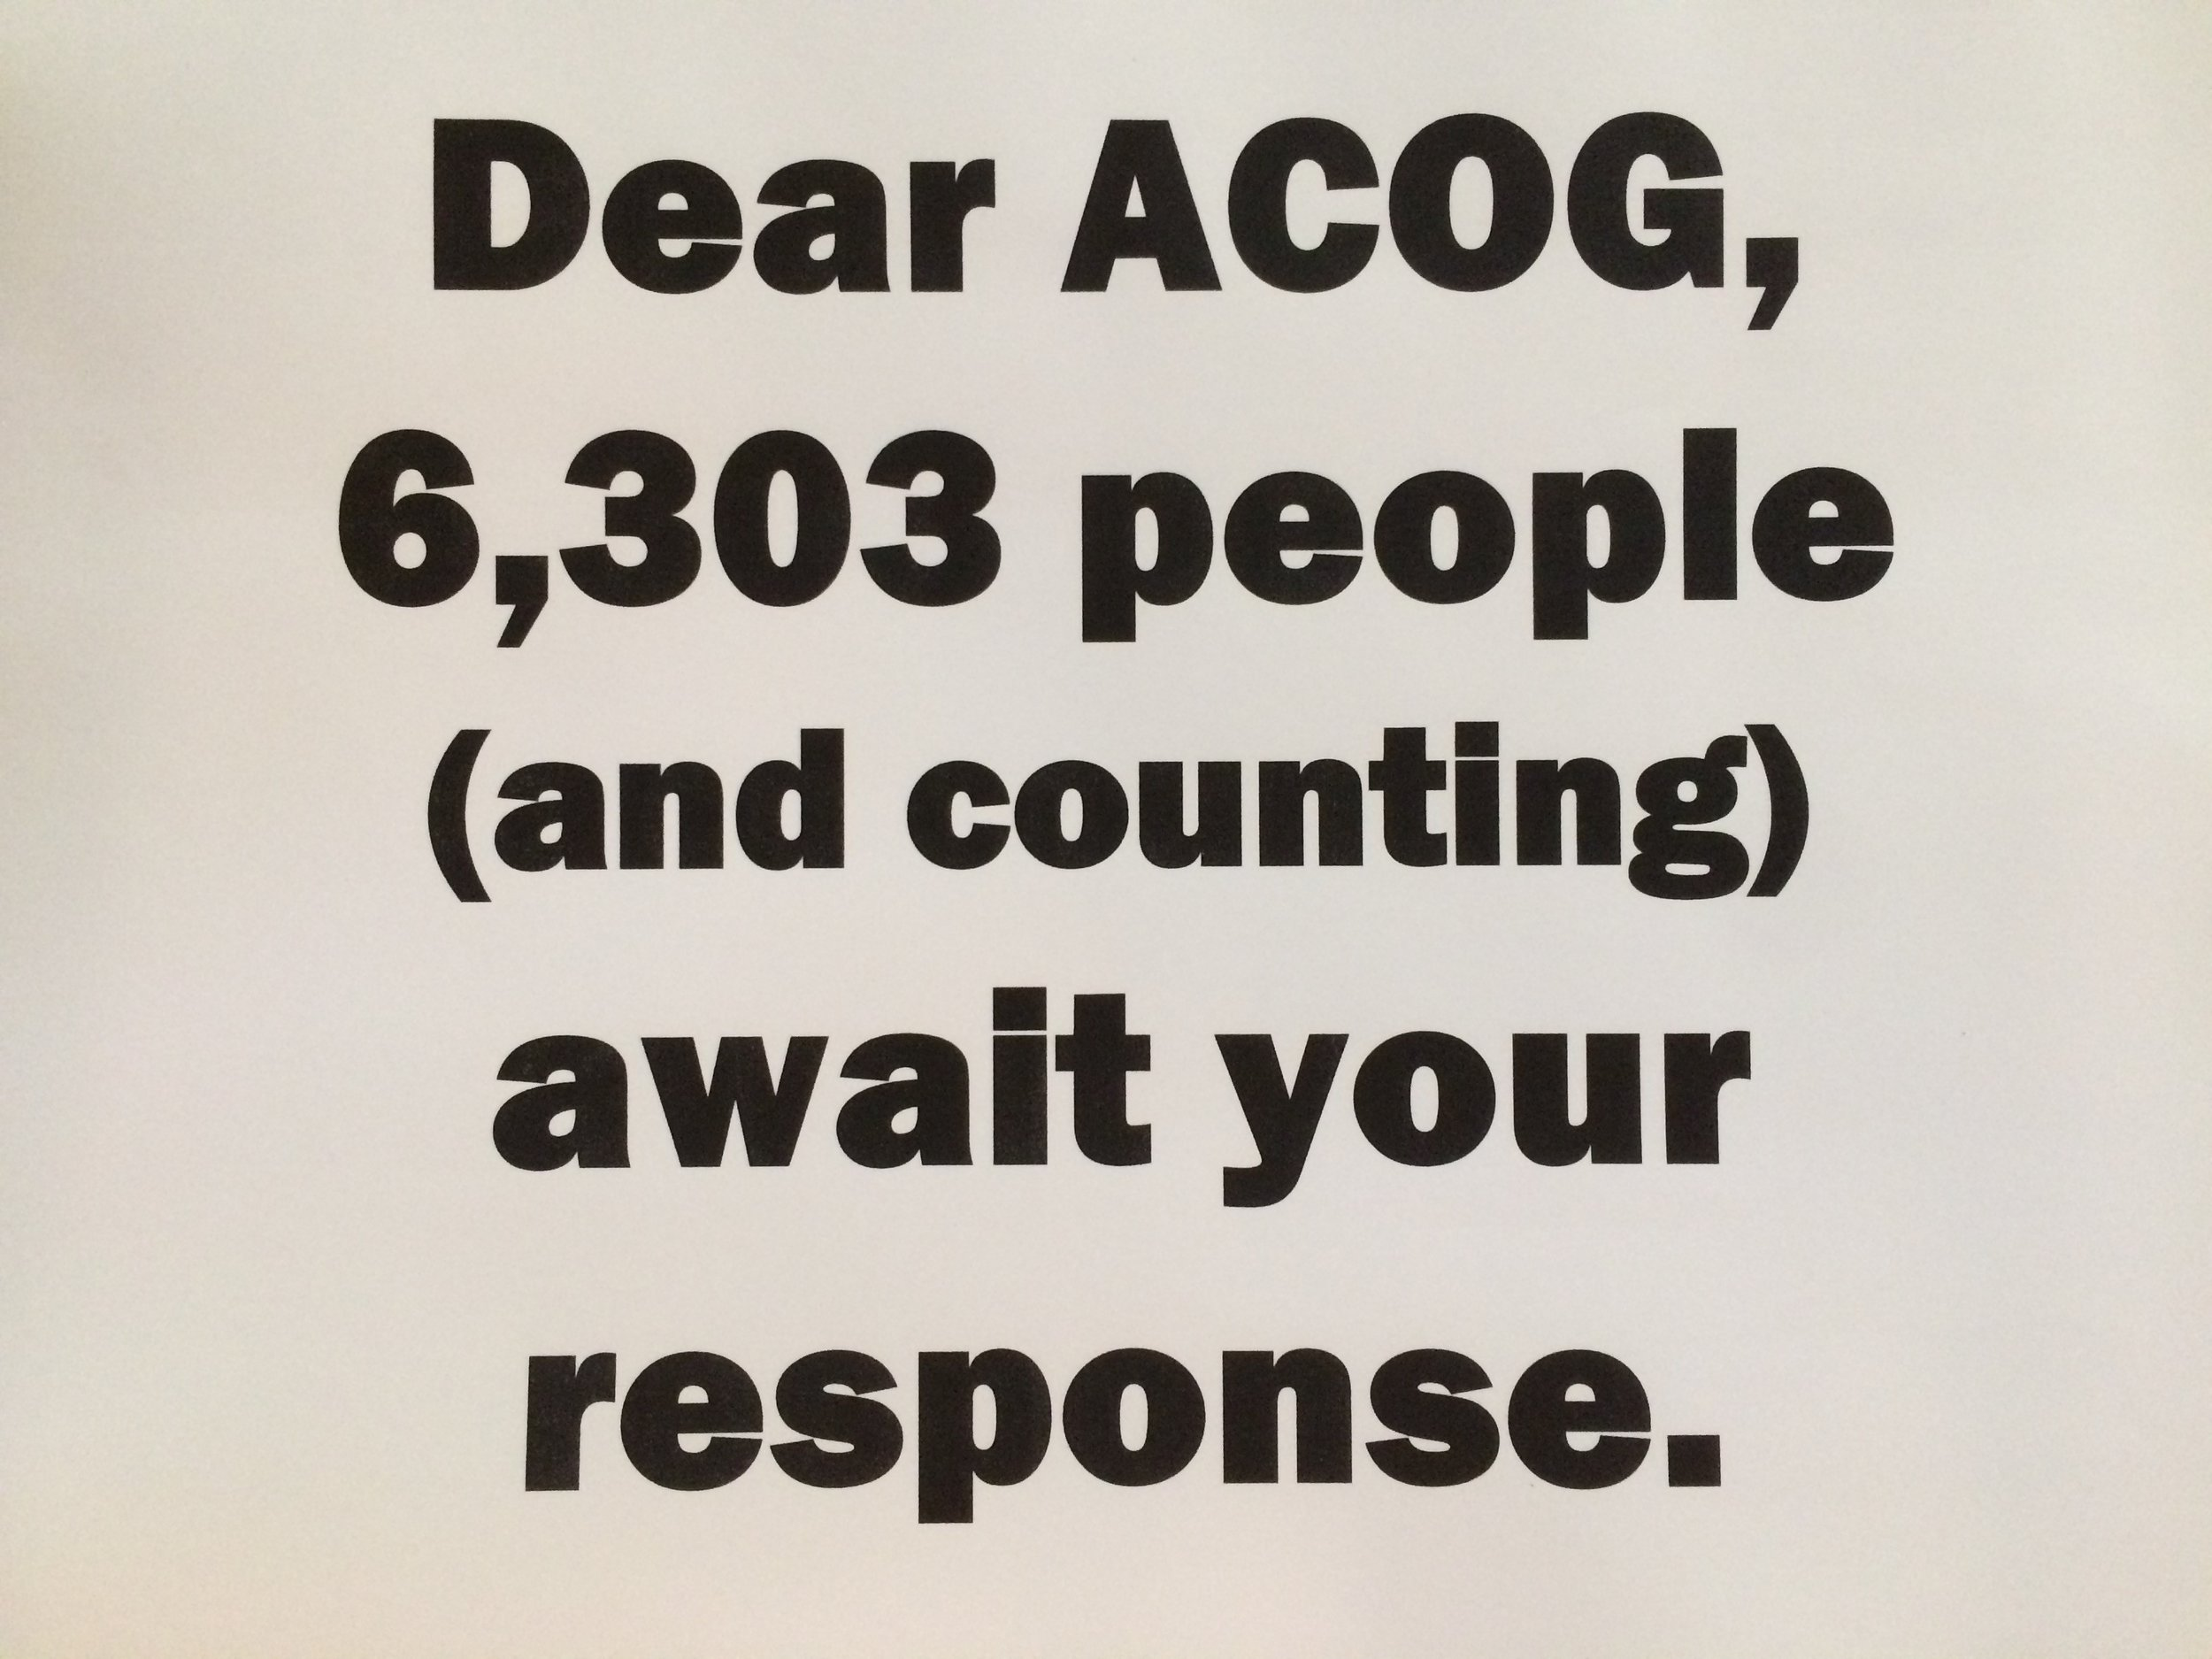 acog await response.jpg